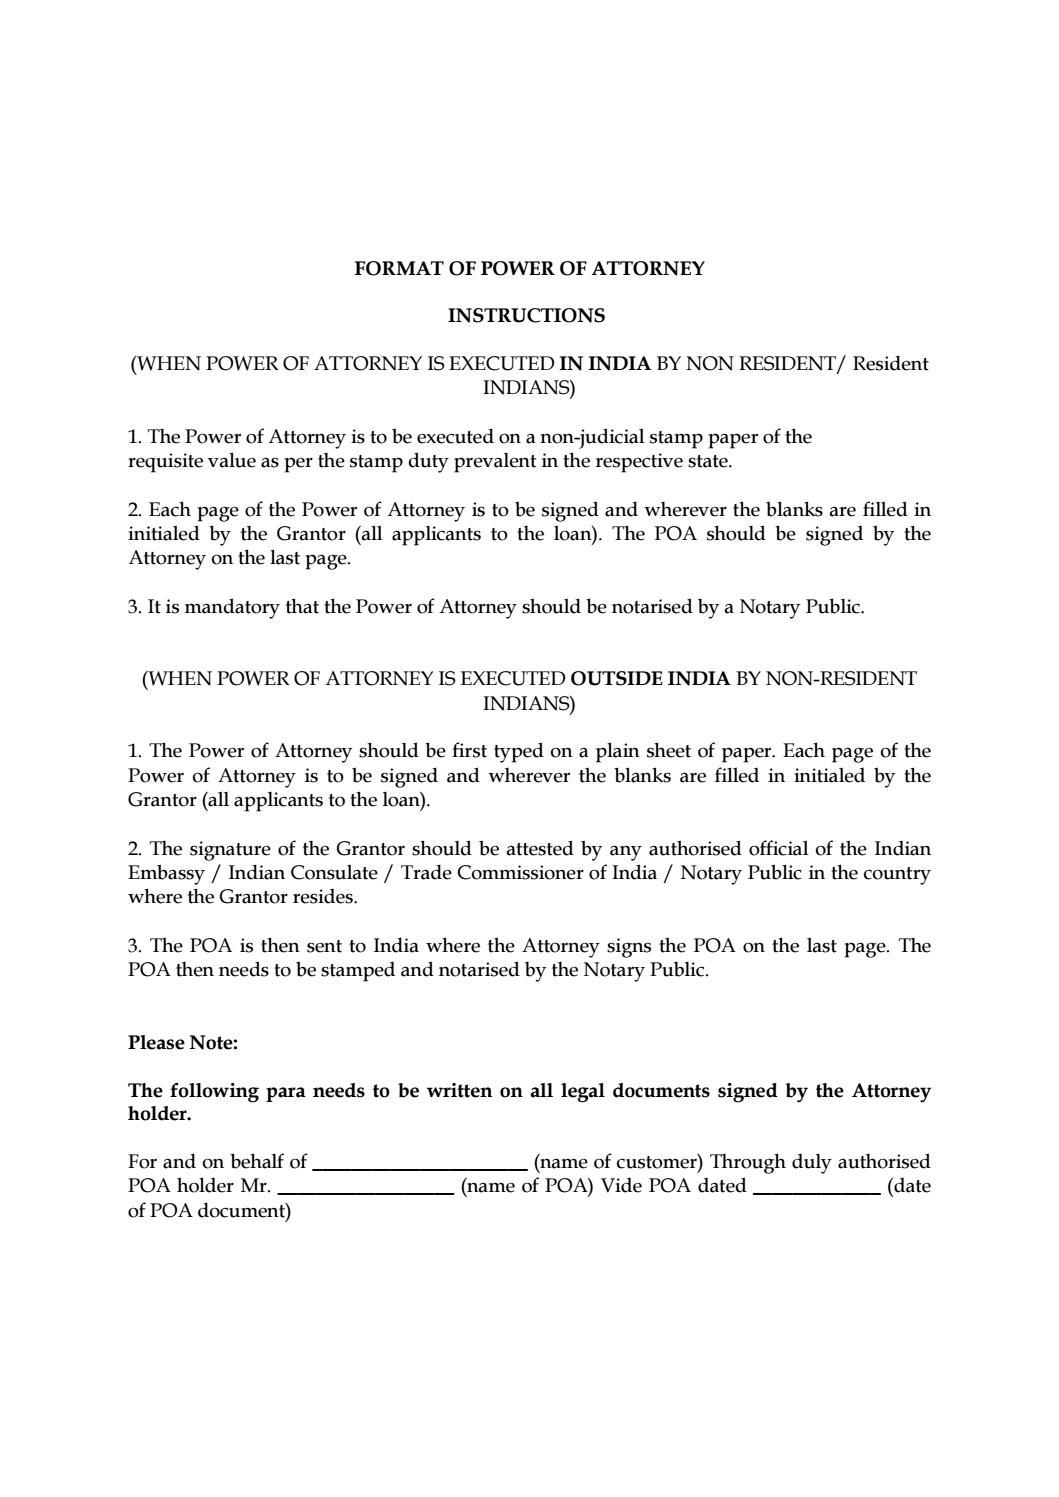 Notarised power of attorney